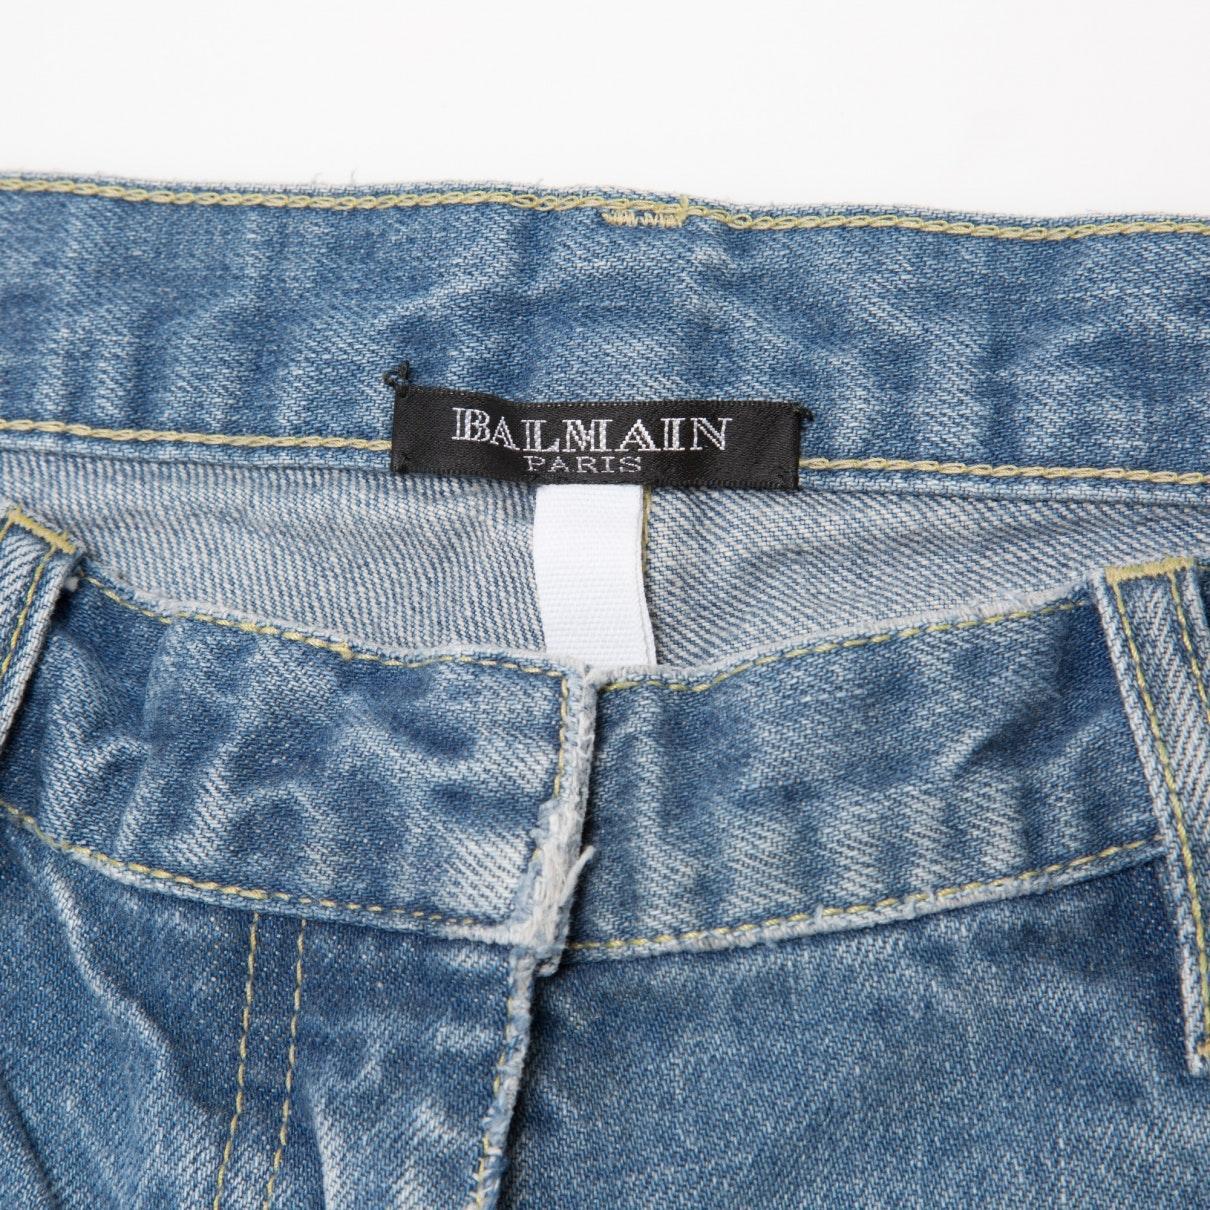 Balmain Denim Skinny Jeans in Blau eiynn